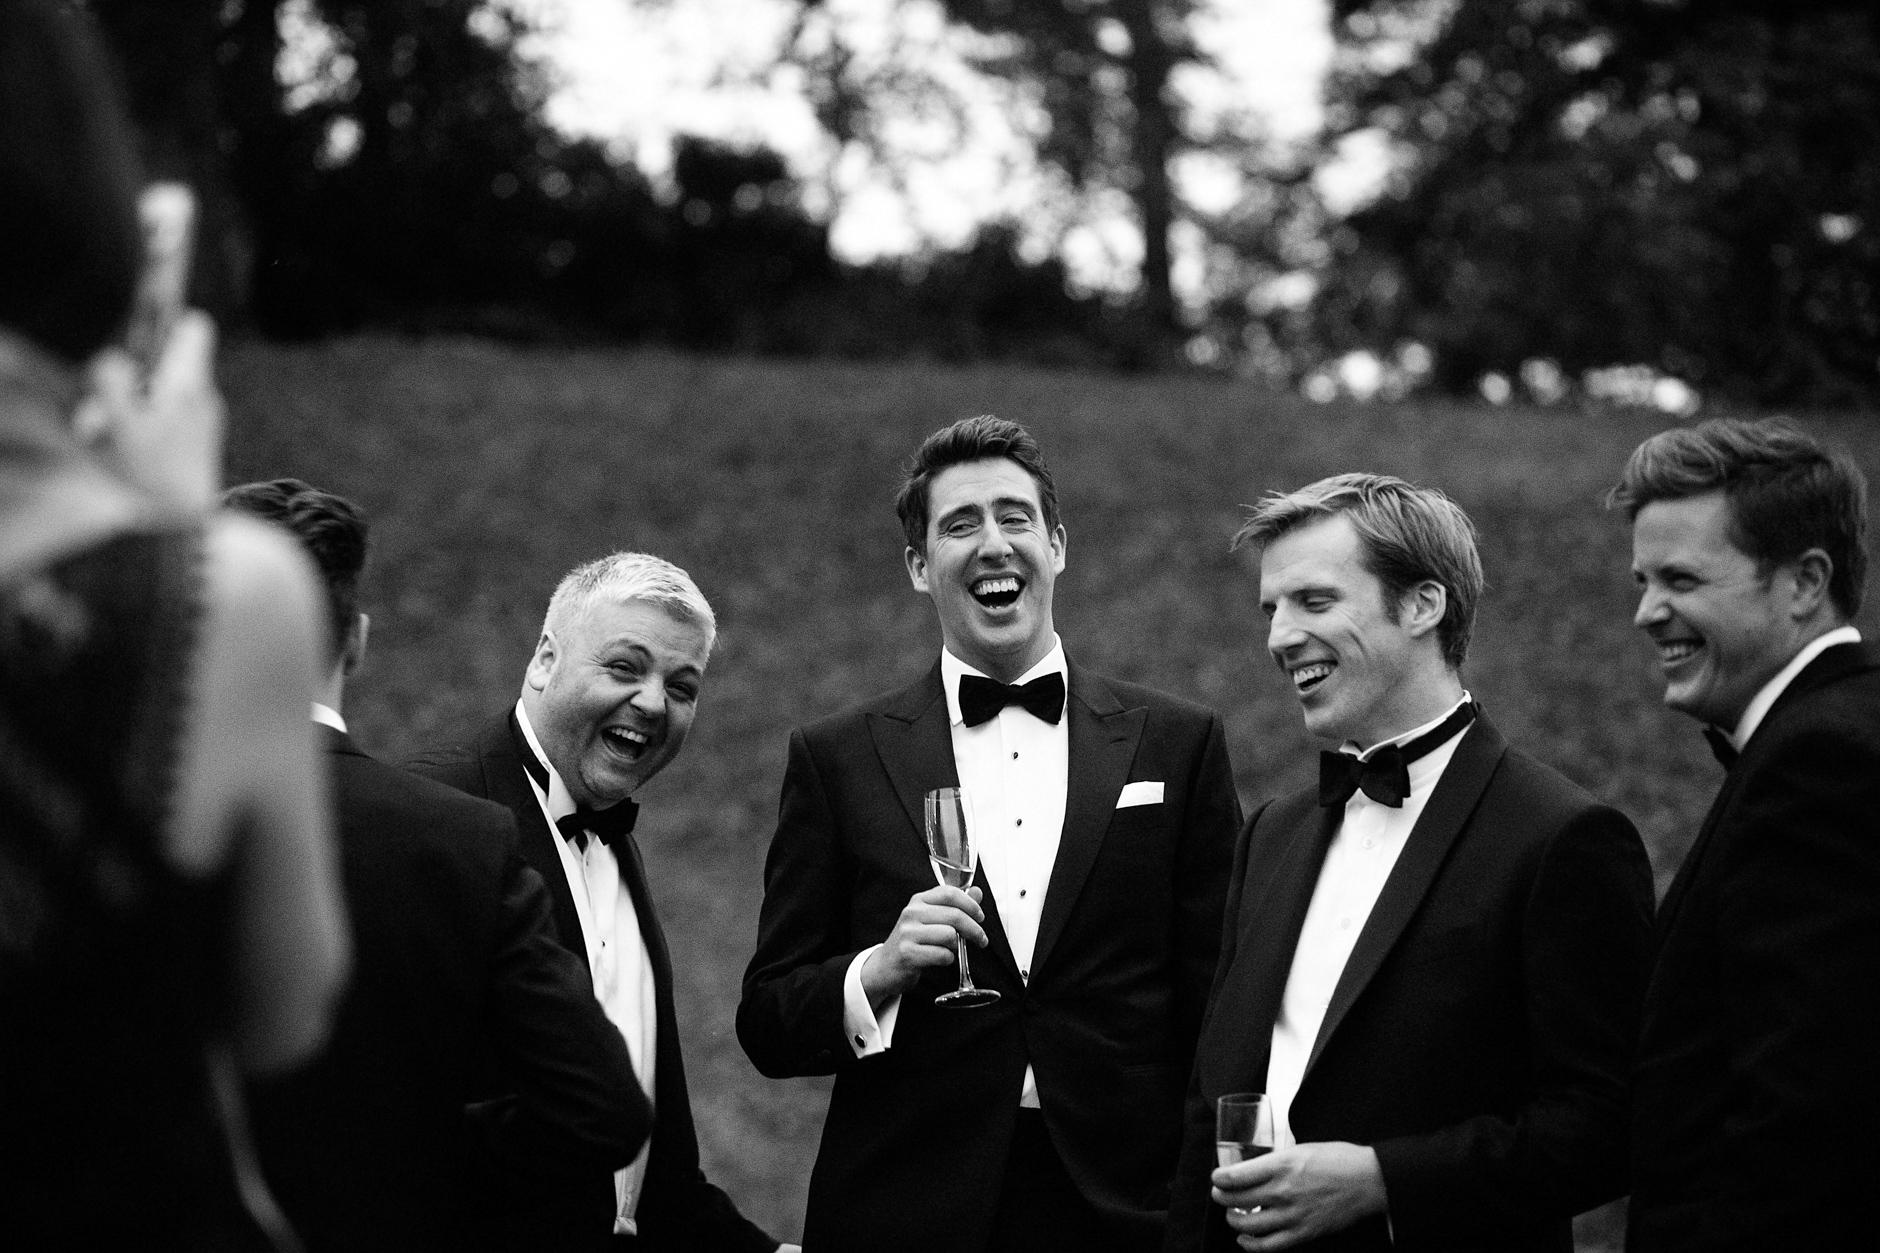 Glentruim-Wedding-Nikki-Leadbetter-Photography-235.jpg